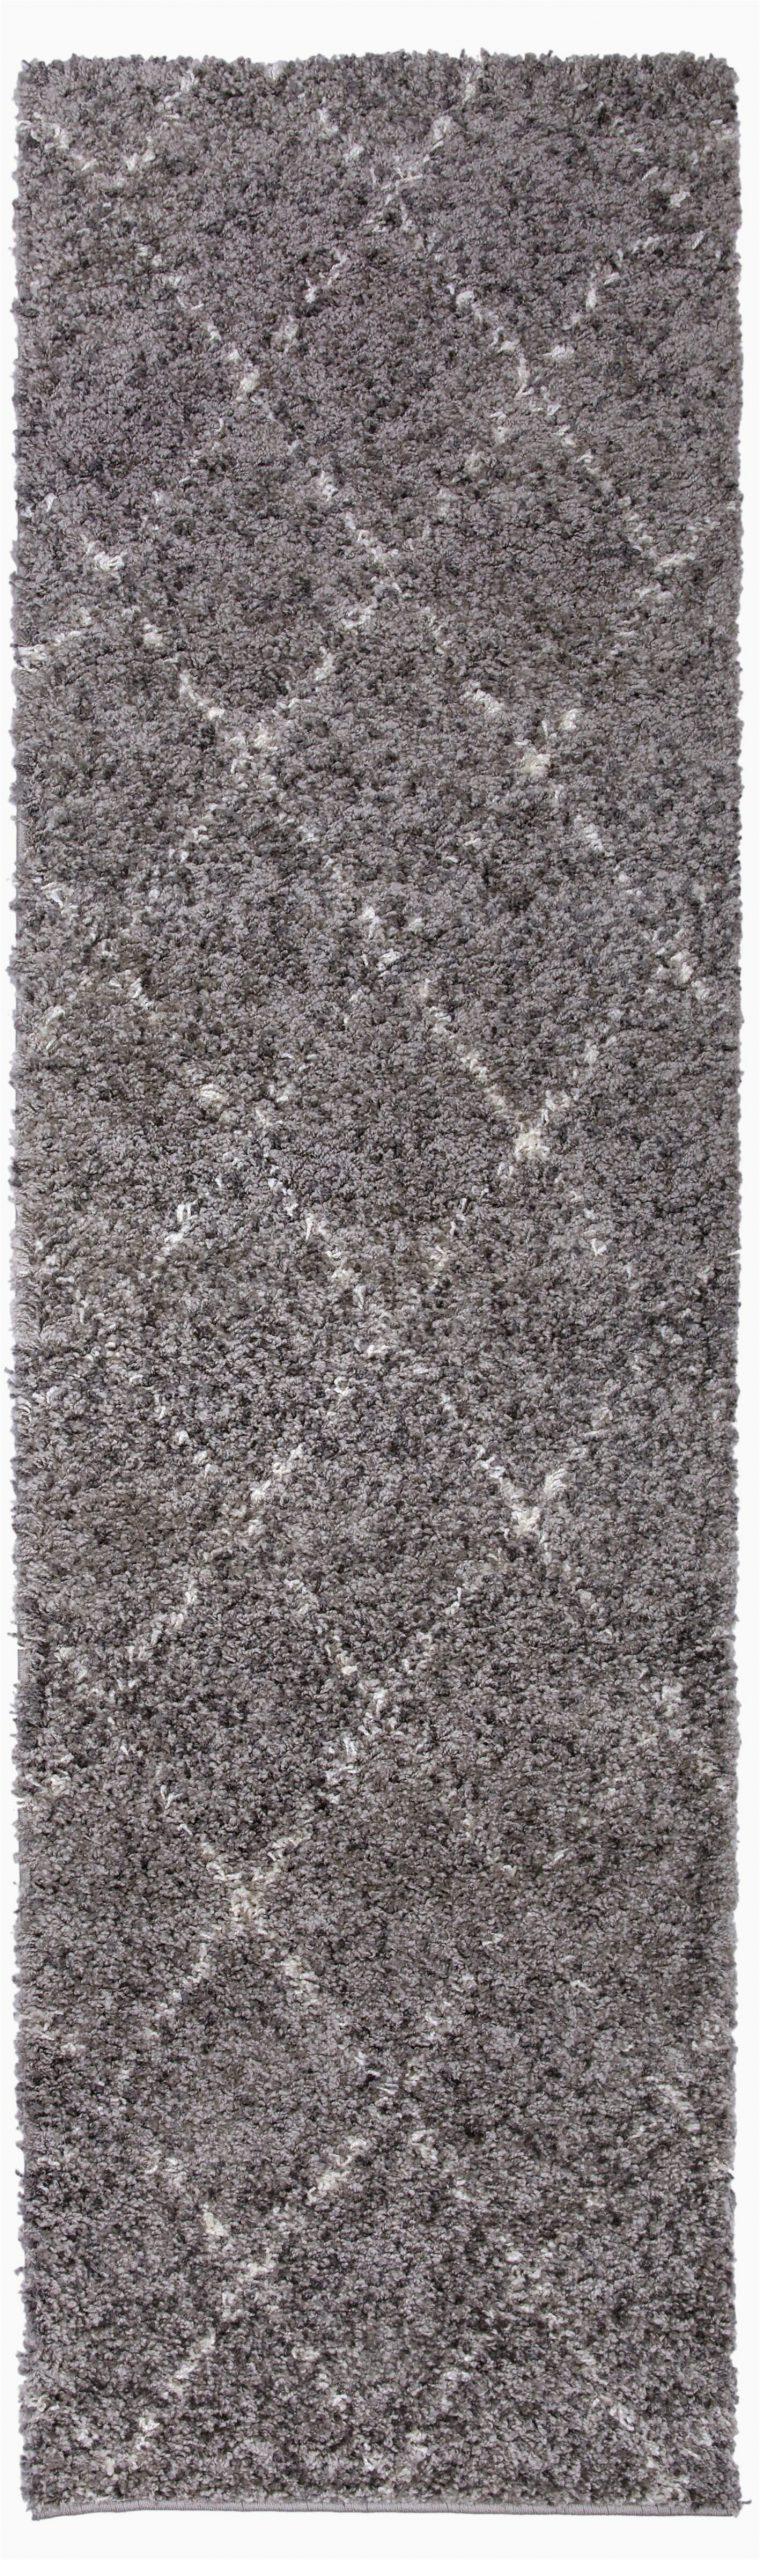 weatherspoon cozy trellis gray area rug